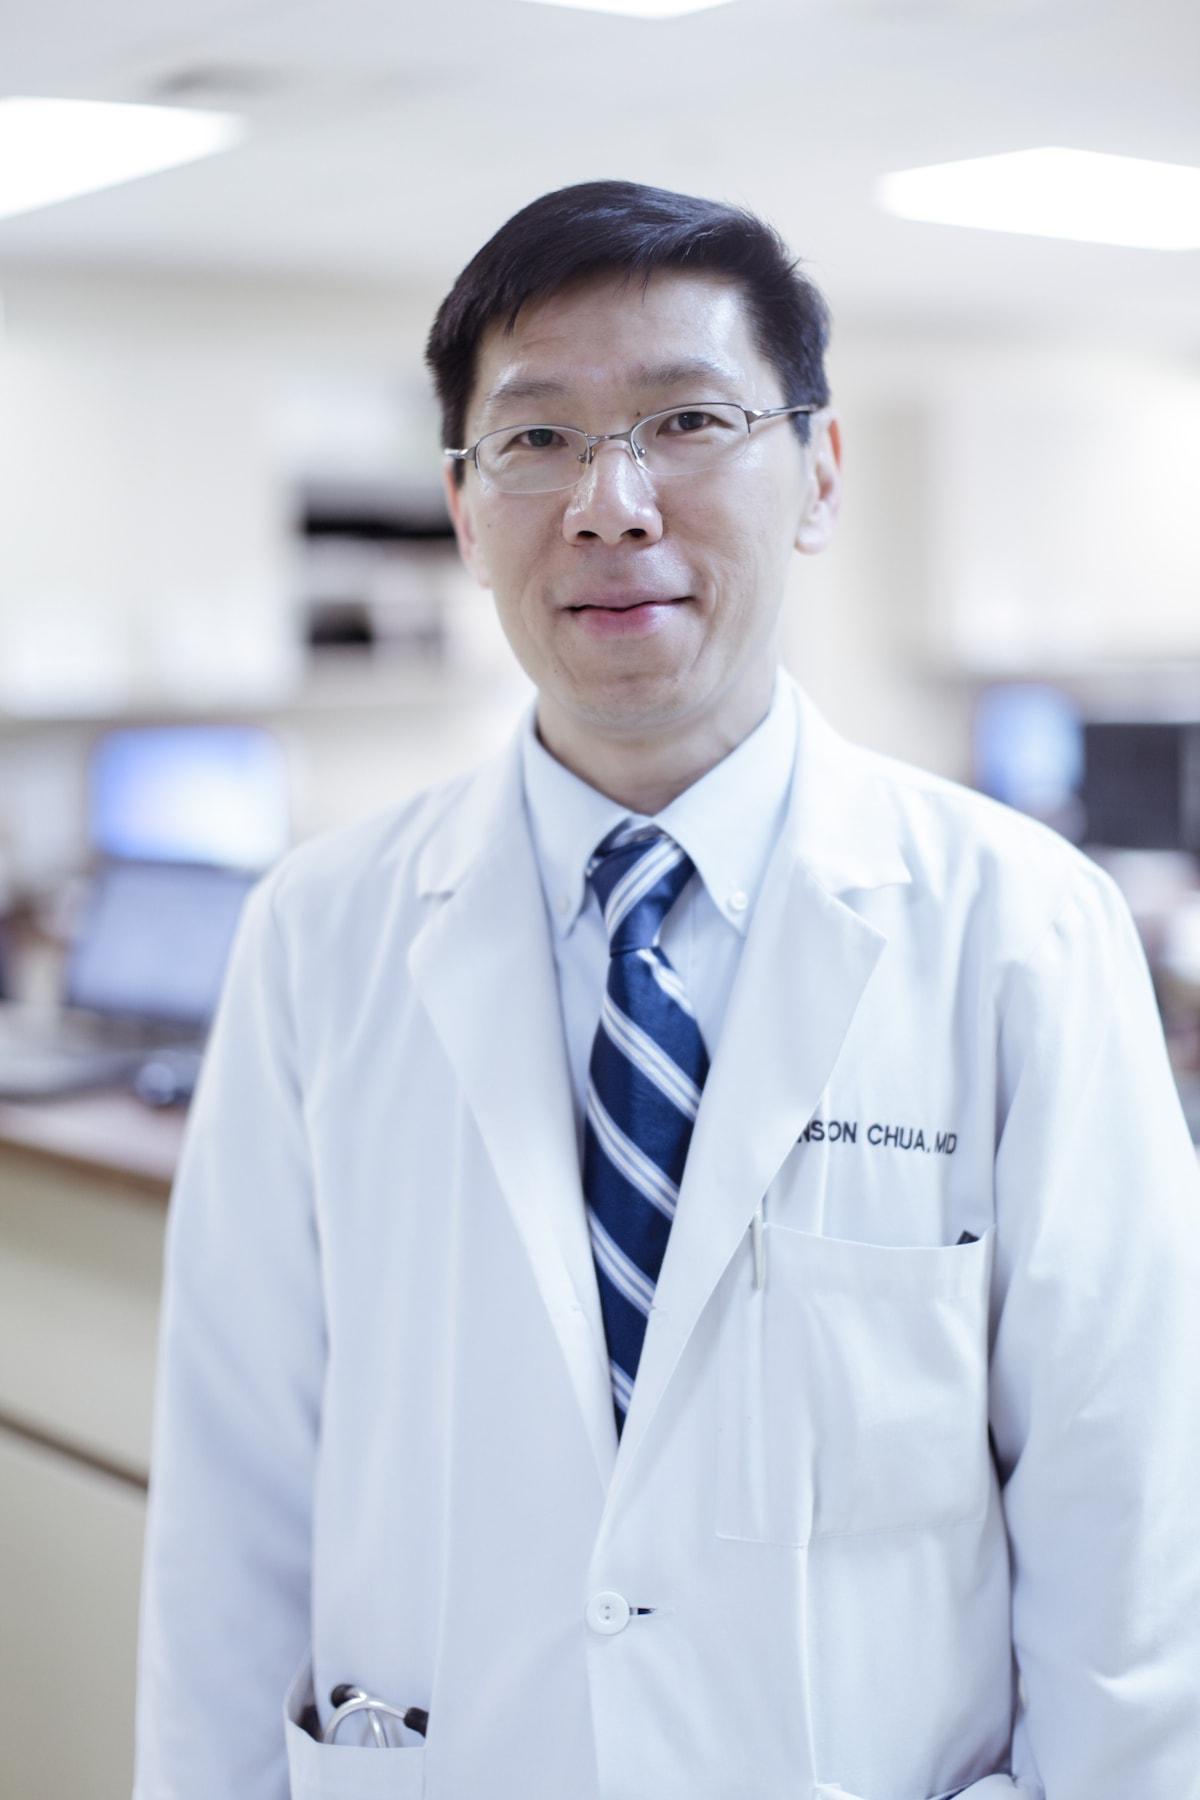 Dr. Winston C Chua MD